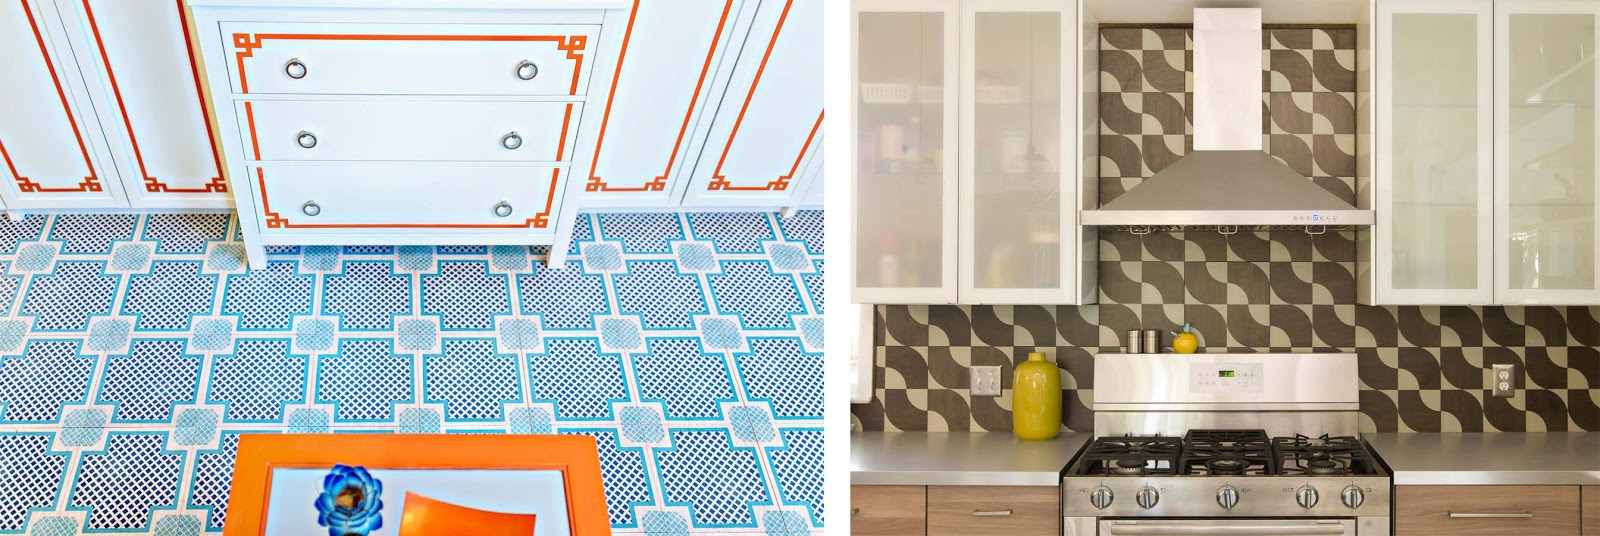 Mirth Studio - Colorful Patterned Hardwood Floor Tiles